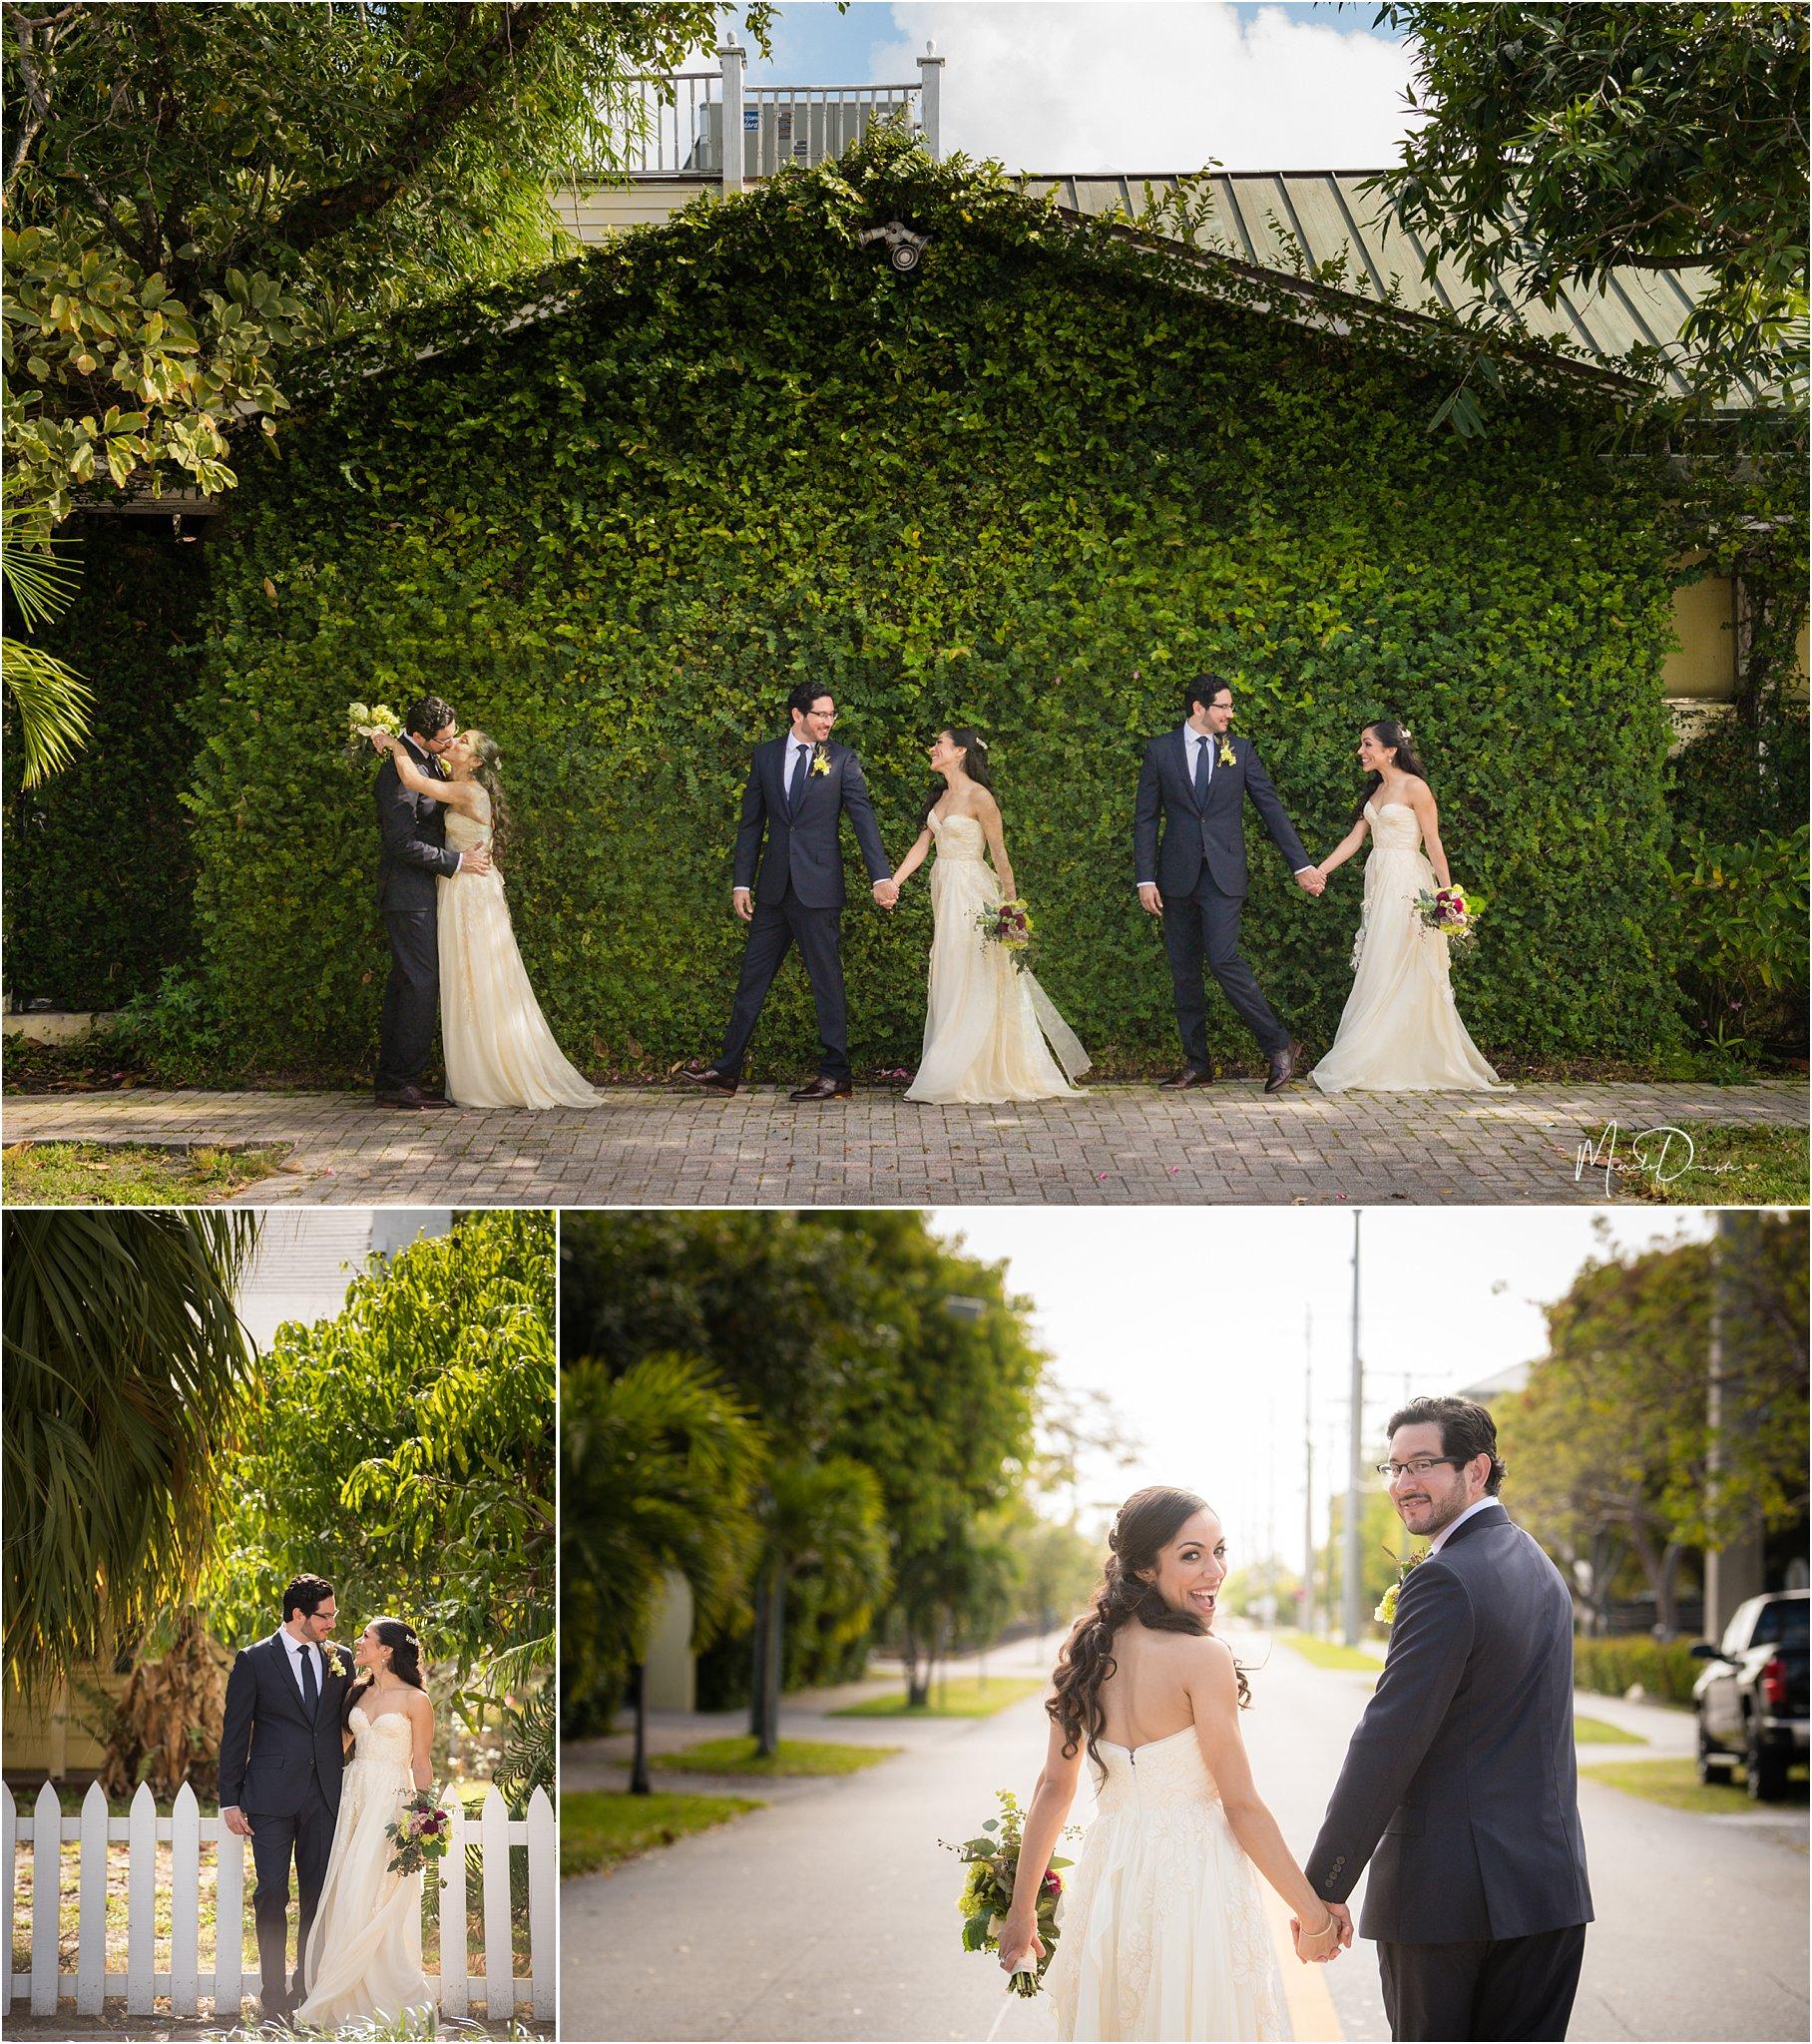 0513_ManoloDoreste_InFocusStudios_Wedding_Family_Photography_Miami_MiamiPhotographer.jpg